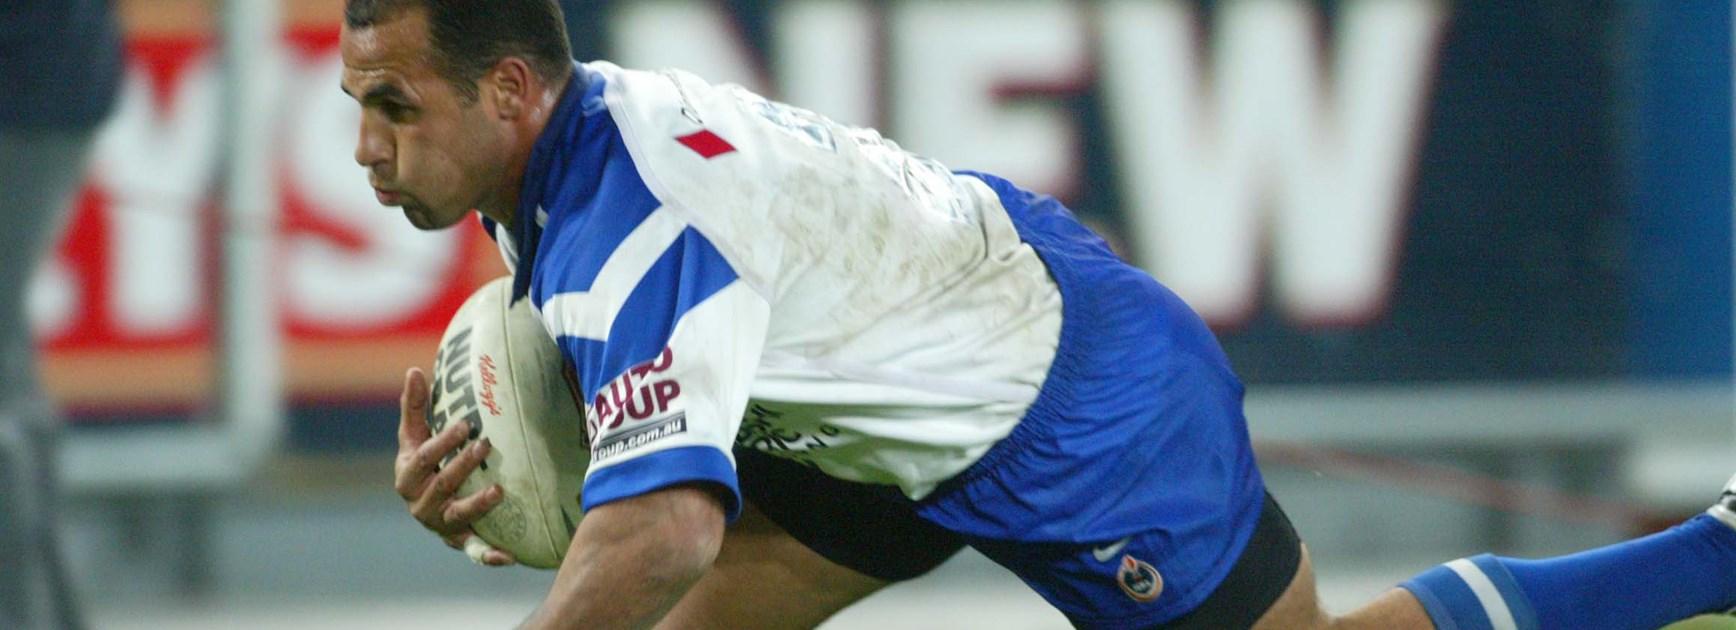 Bulldogs legend Hazem El Masri.